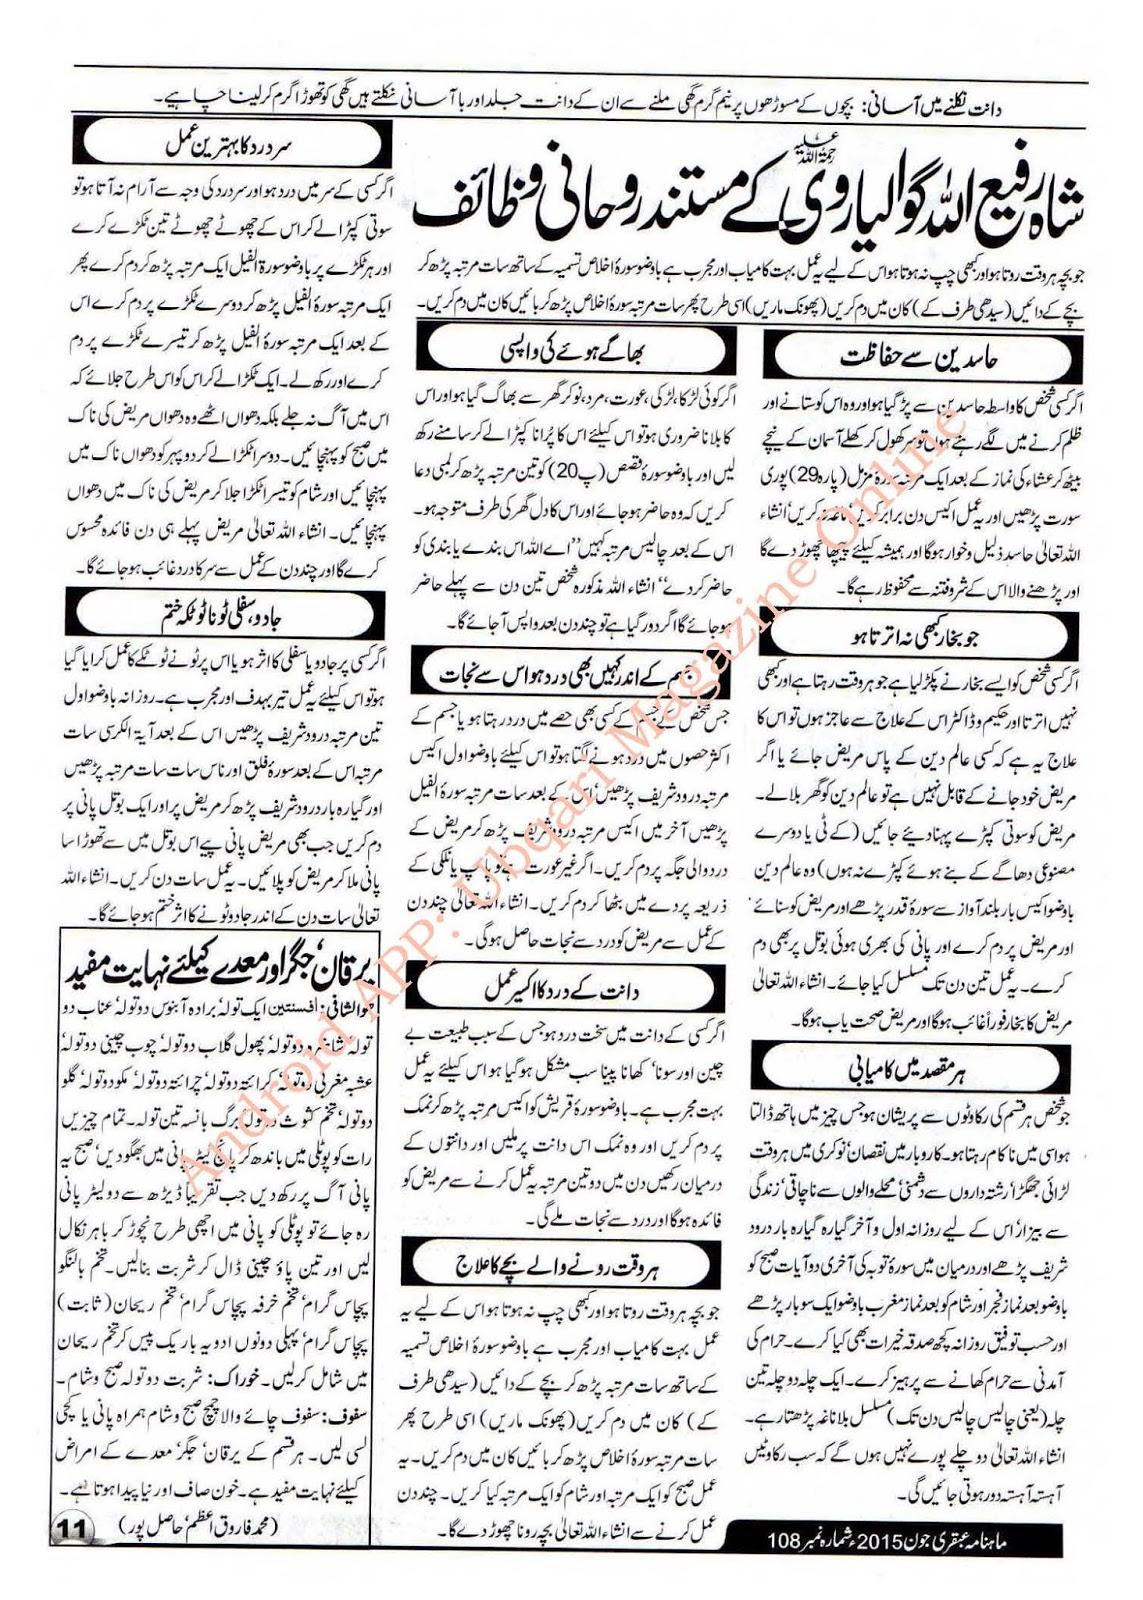 Ubqari Magazine November Of 2013 Related Keywords Suggestions